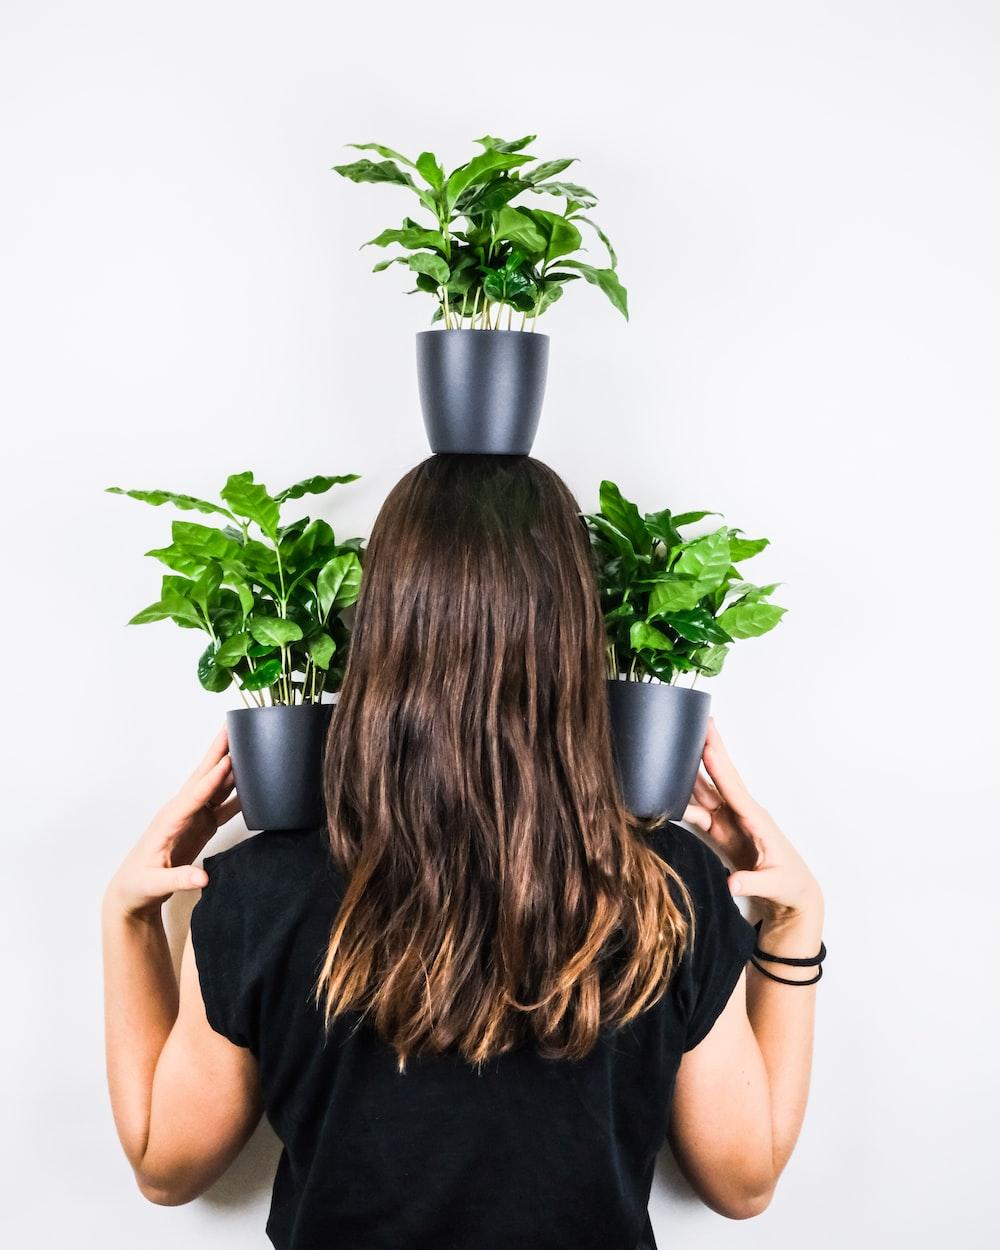 woman in black sleeveless dress holding green plant